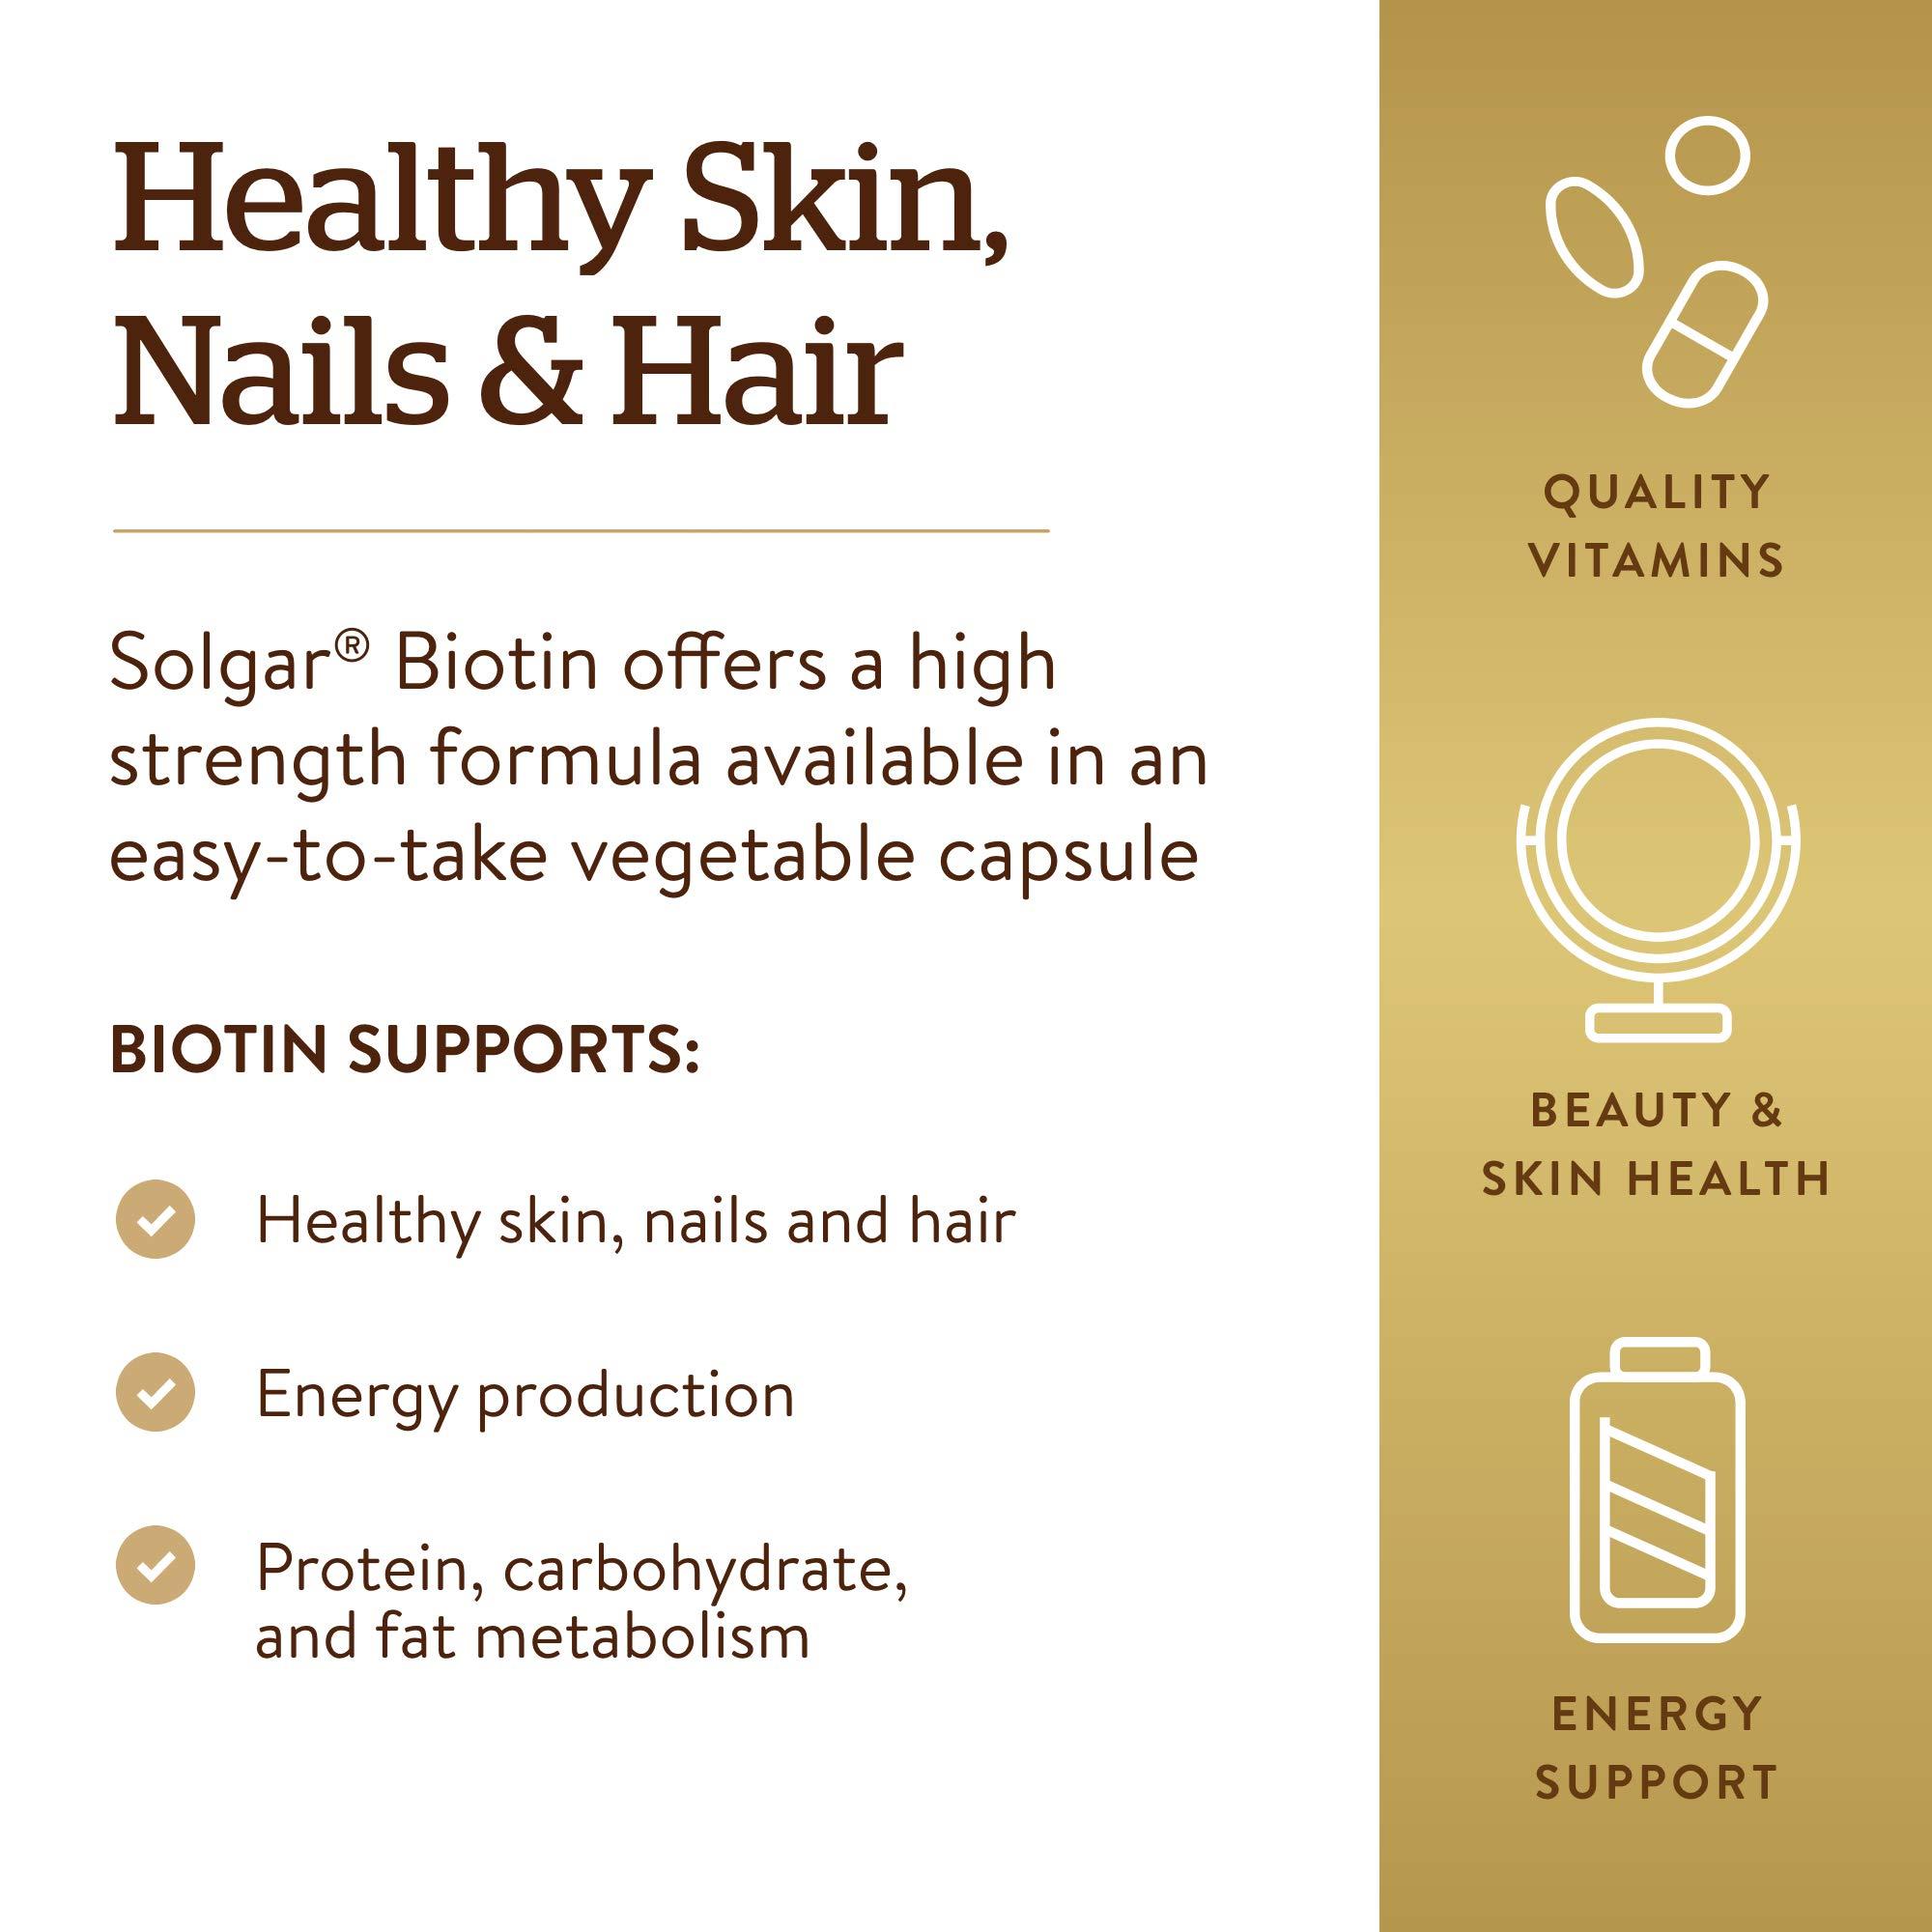 Solgar – Biotin 1,000 mcg, 250 Vegetable Capsules